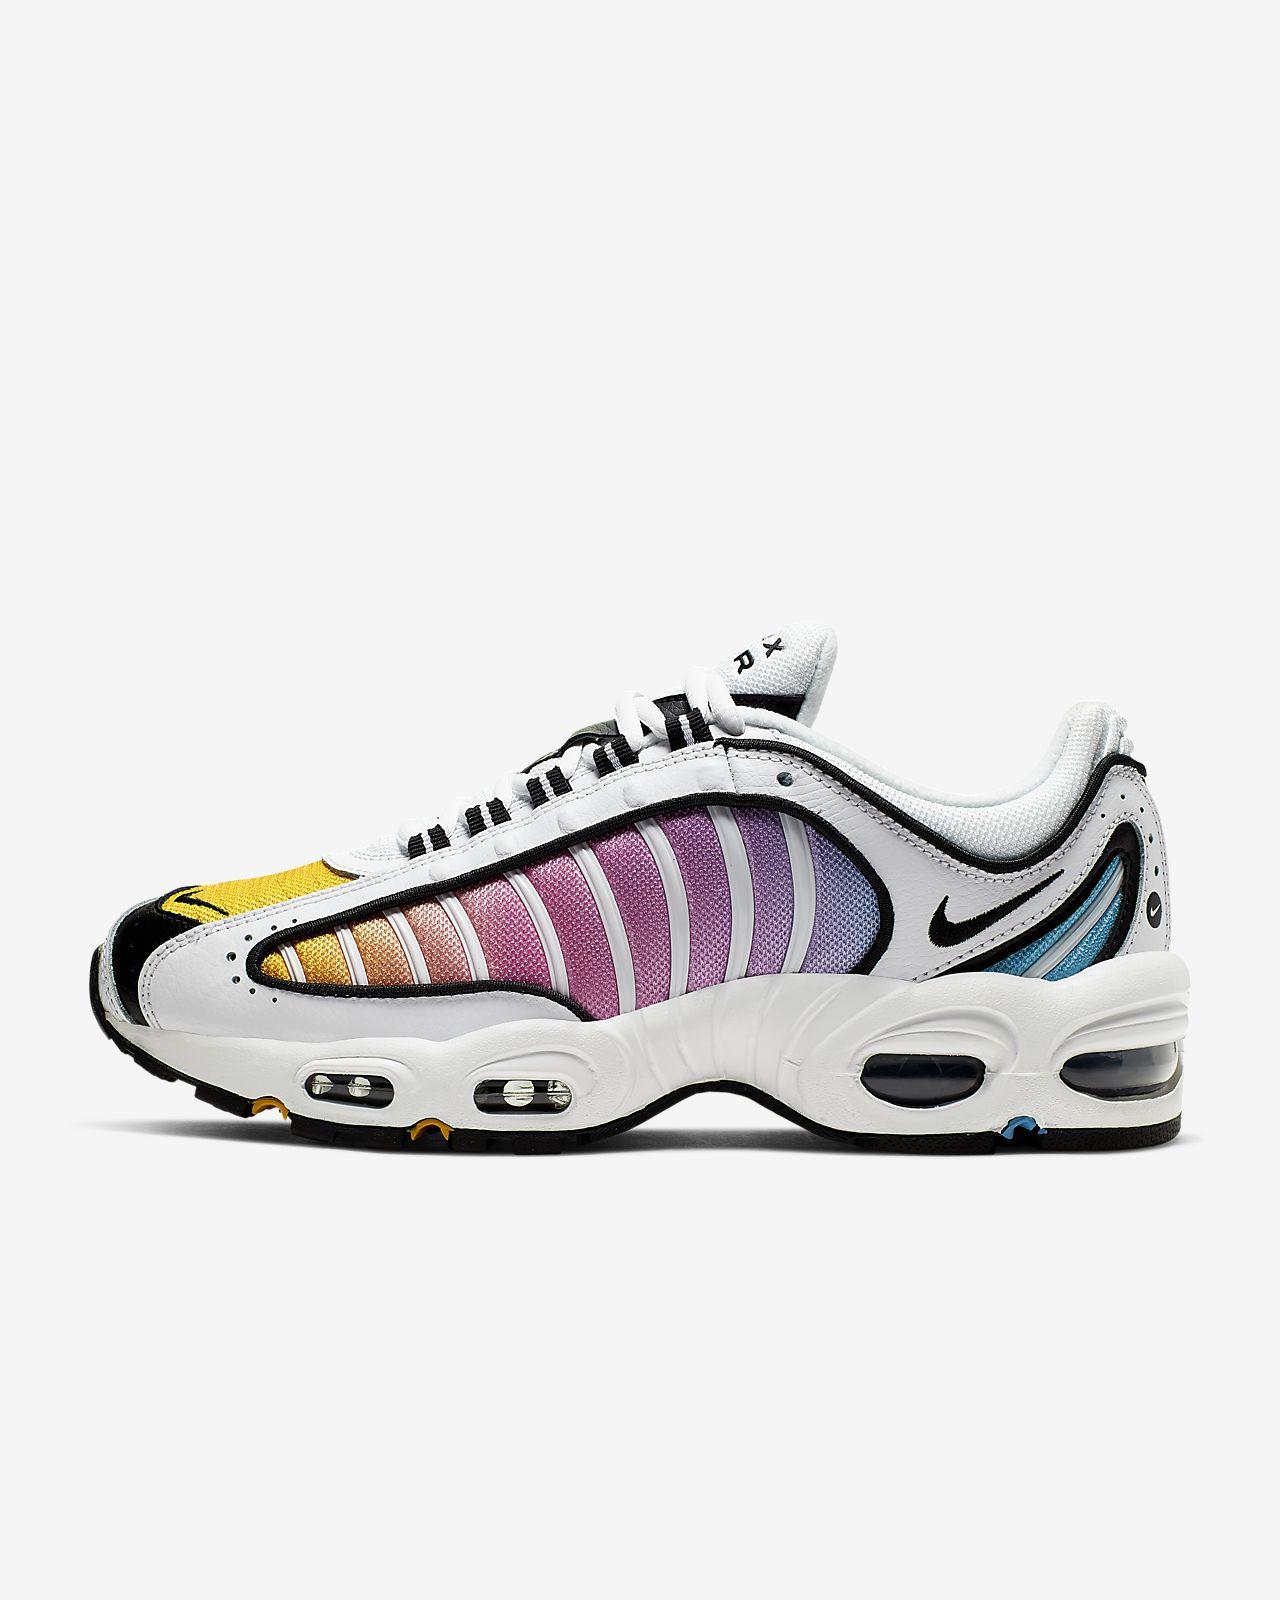 Nike Air Max Tailwind 96 | Zapas